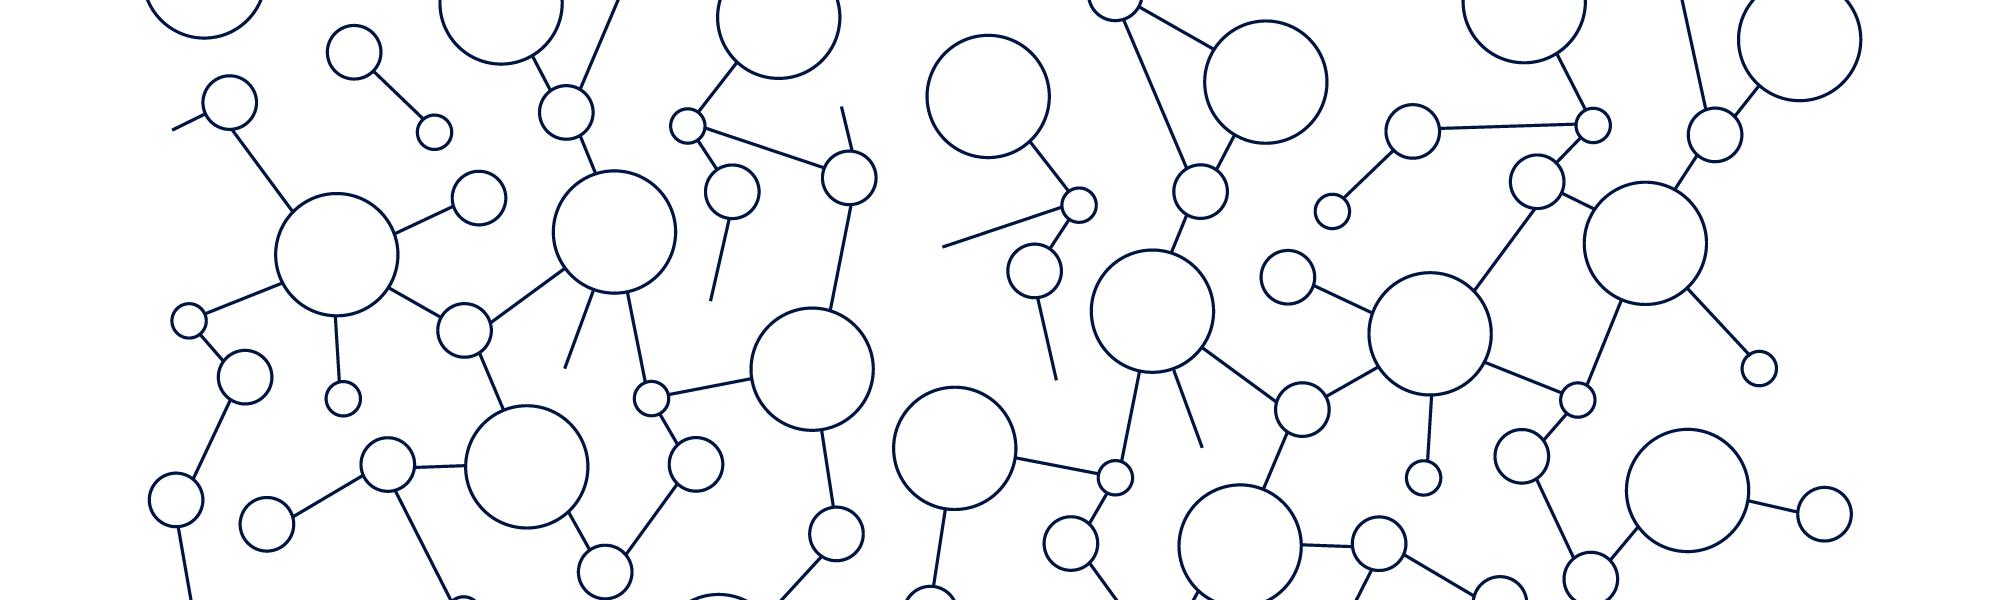 IP Strategy pattern